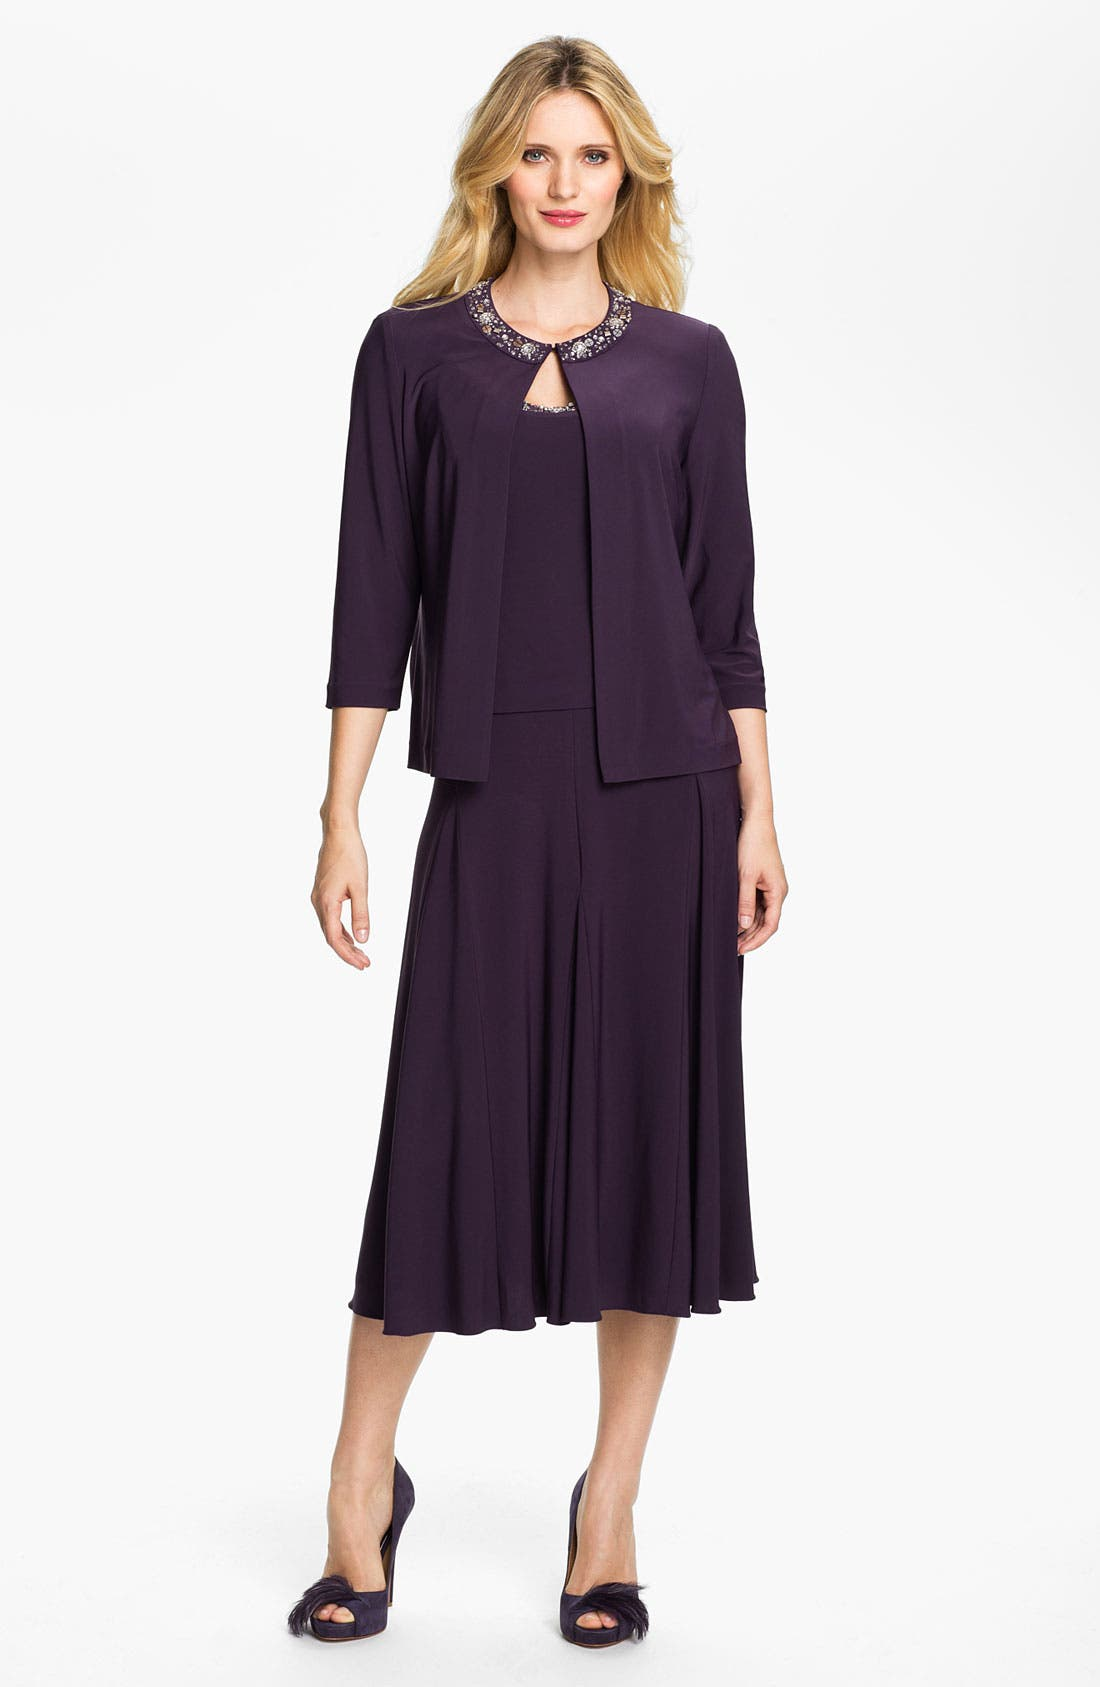 Alternate Image 1 Selected - Alex Evenings Beaded Jersey Dress & Jacket